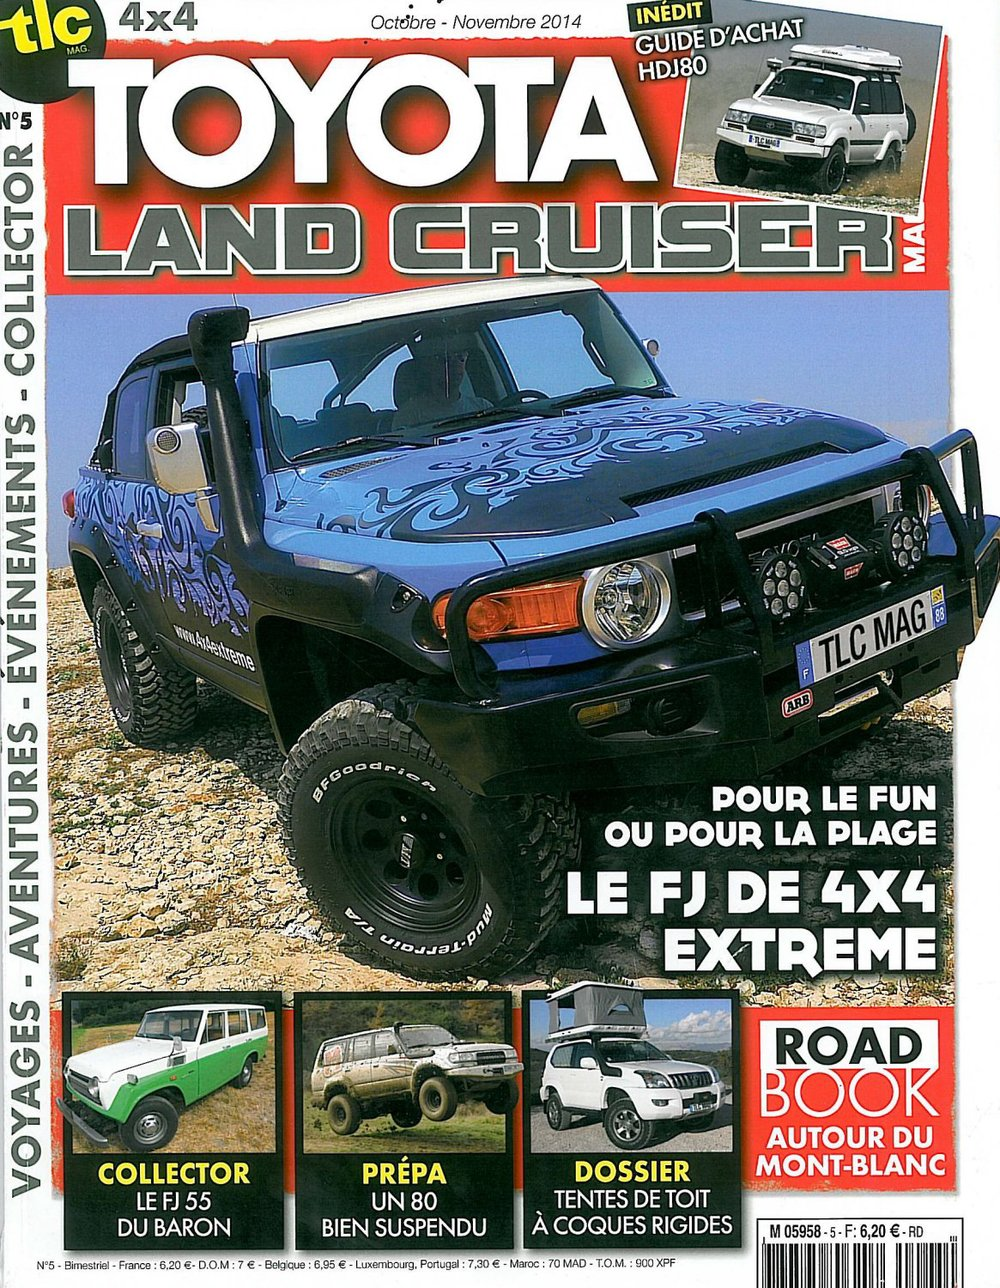 Toyota Land Cruiser Magazine 2014-10 francais_Seite_1.jpg